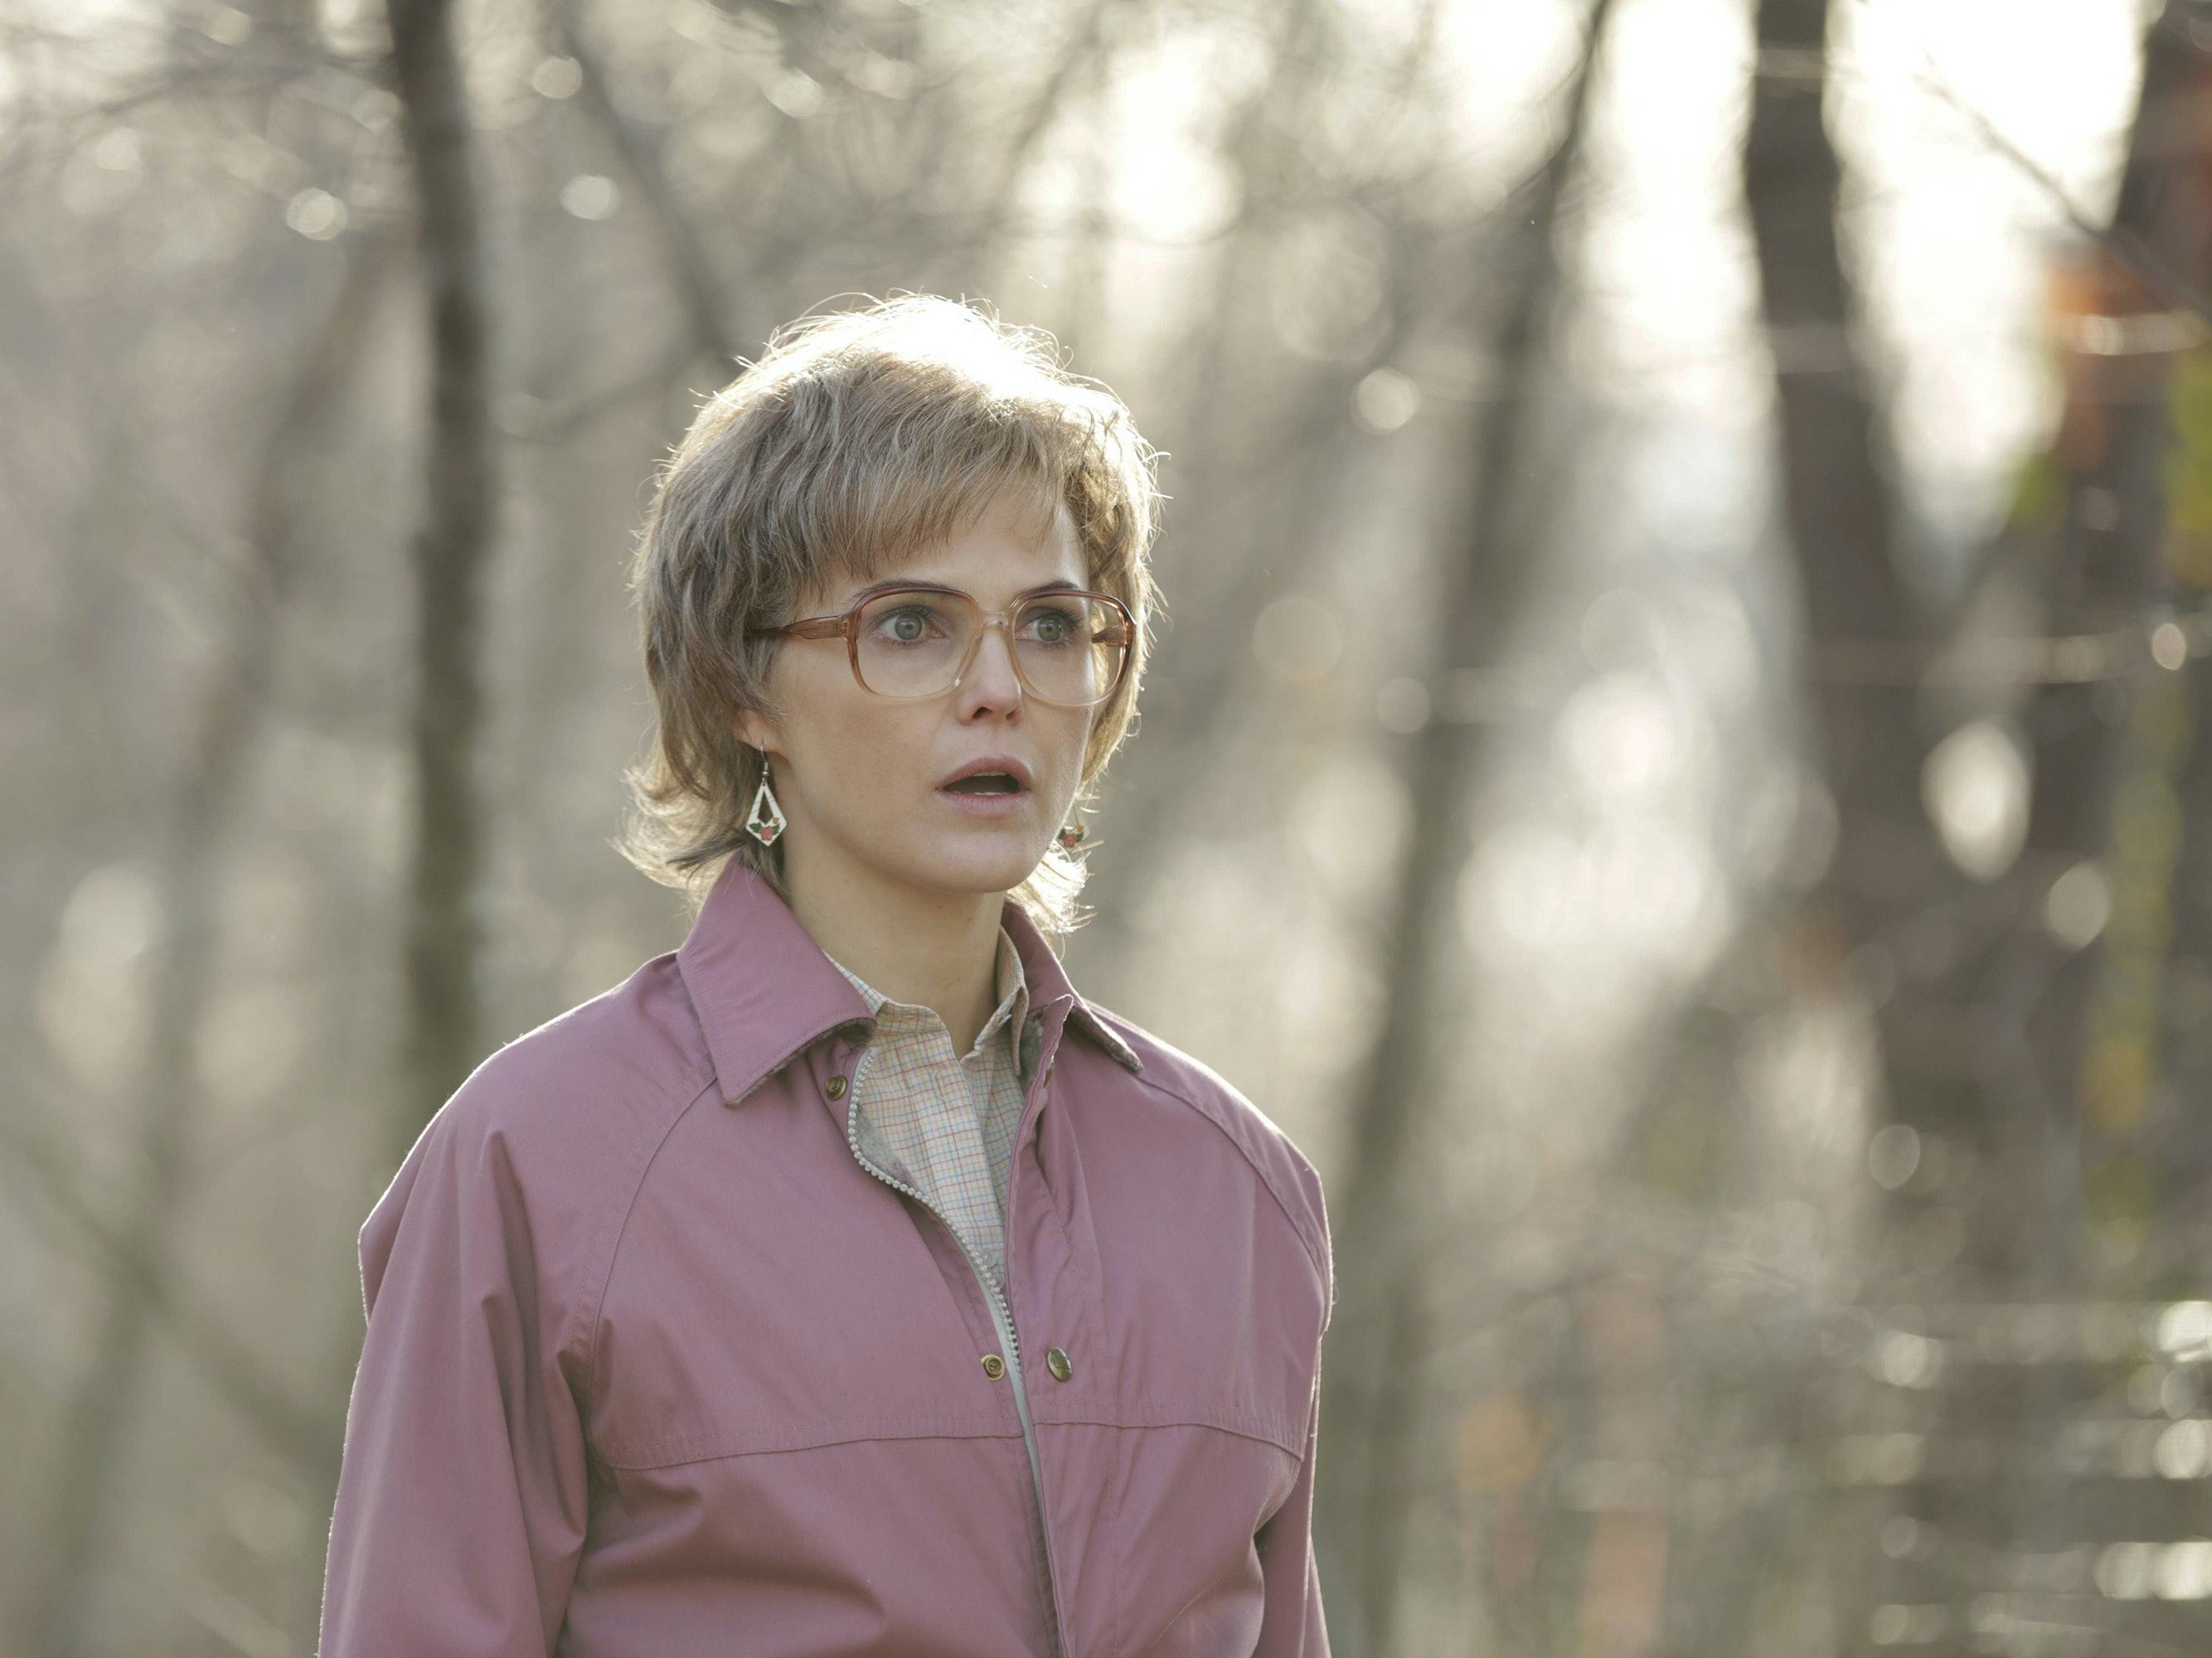 The Martha Saga on 'The Americans' Just Got Messier